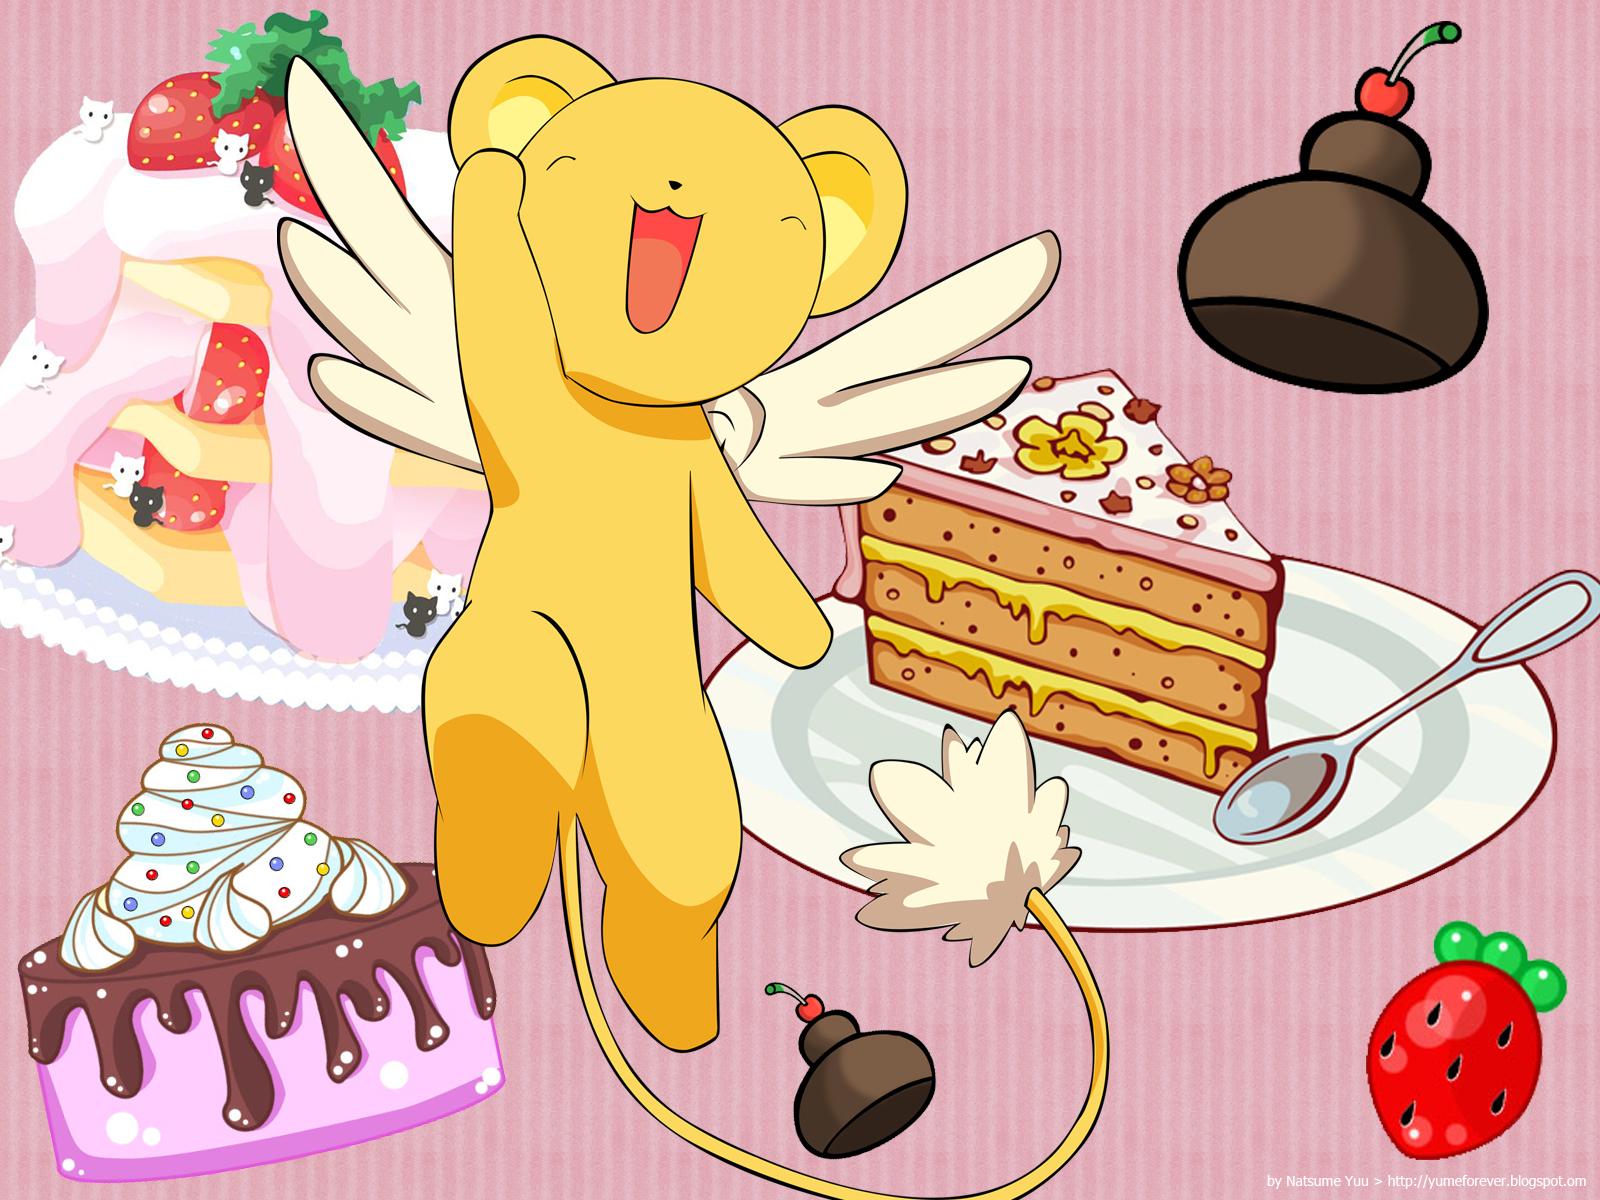 http://2.bp.blogspot.com/-1UzdnbfxA-o/Tl2Onjg74wI/AAAAAAAAARk/ytKr94FgdfE/s1600/129+-+card_captor_sakura+kero+wallpaper.jpg